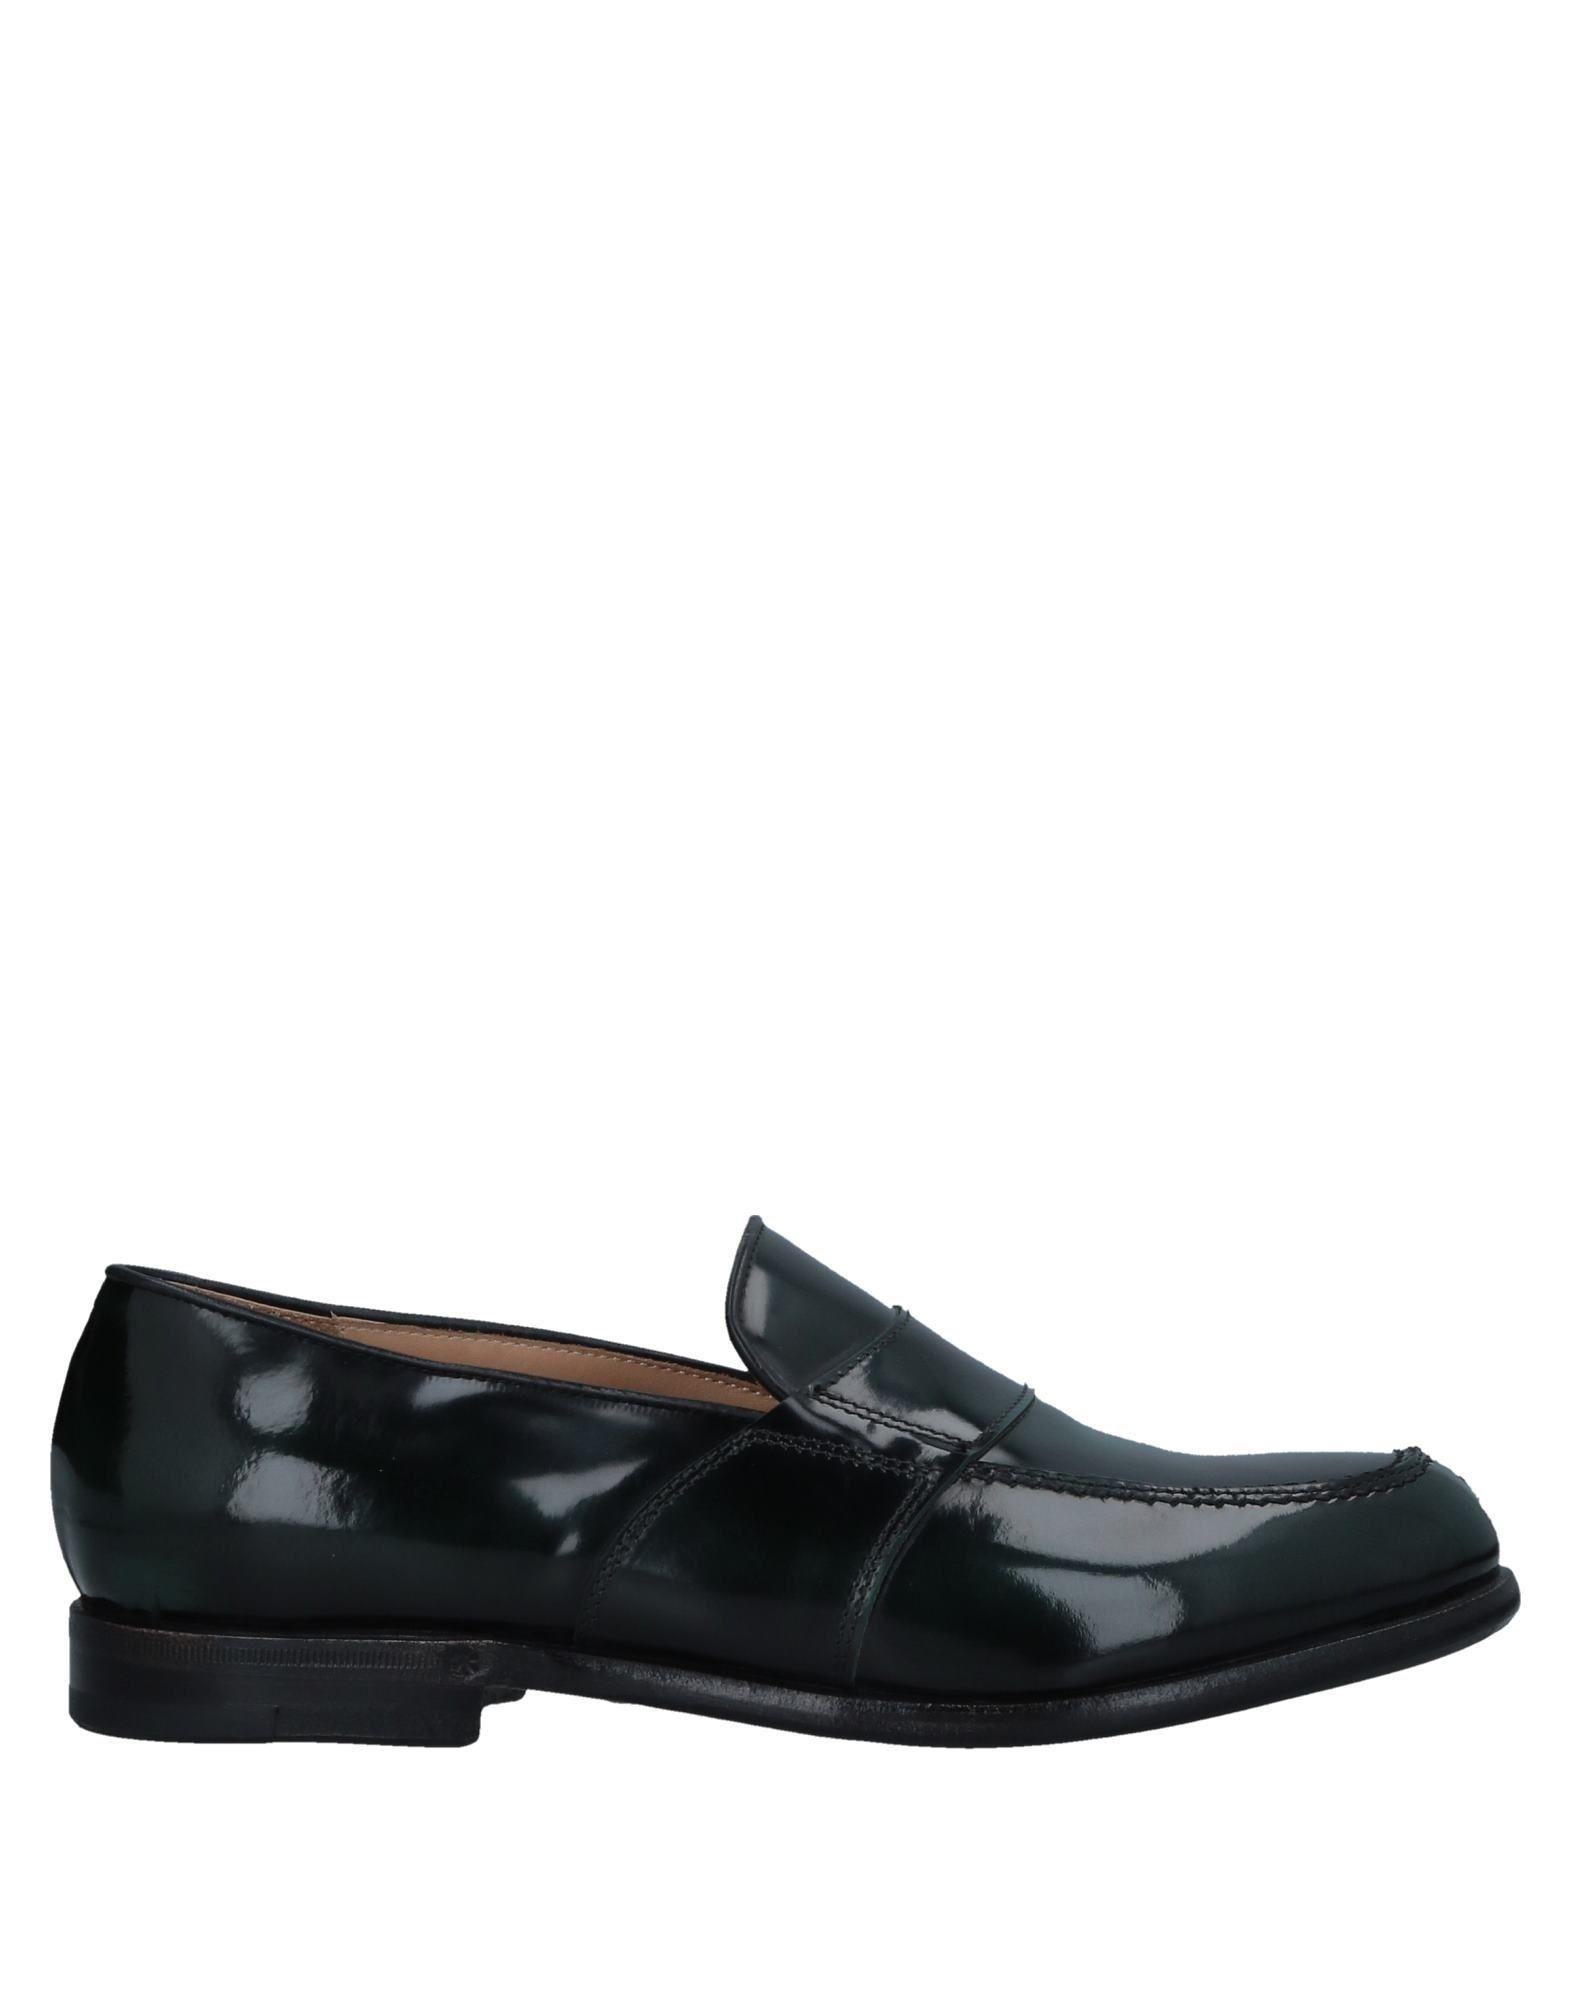 DAMY Loafers in Dark Green